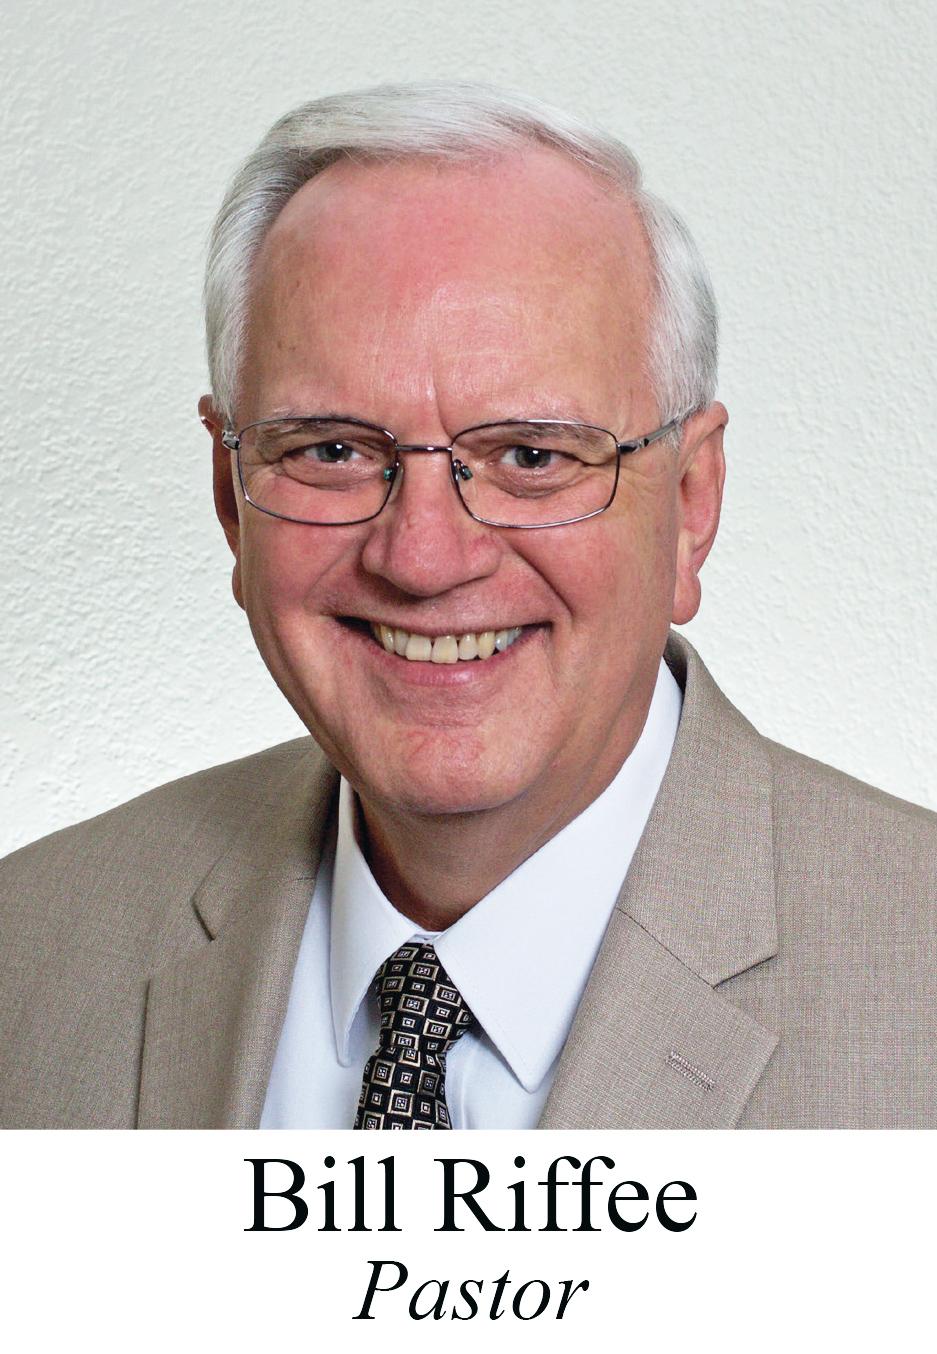 Bill-Riffee-Pastor.jpg